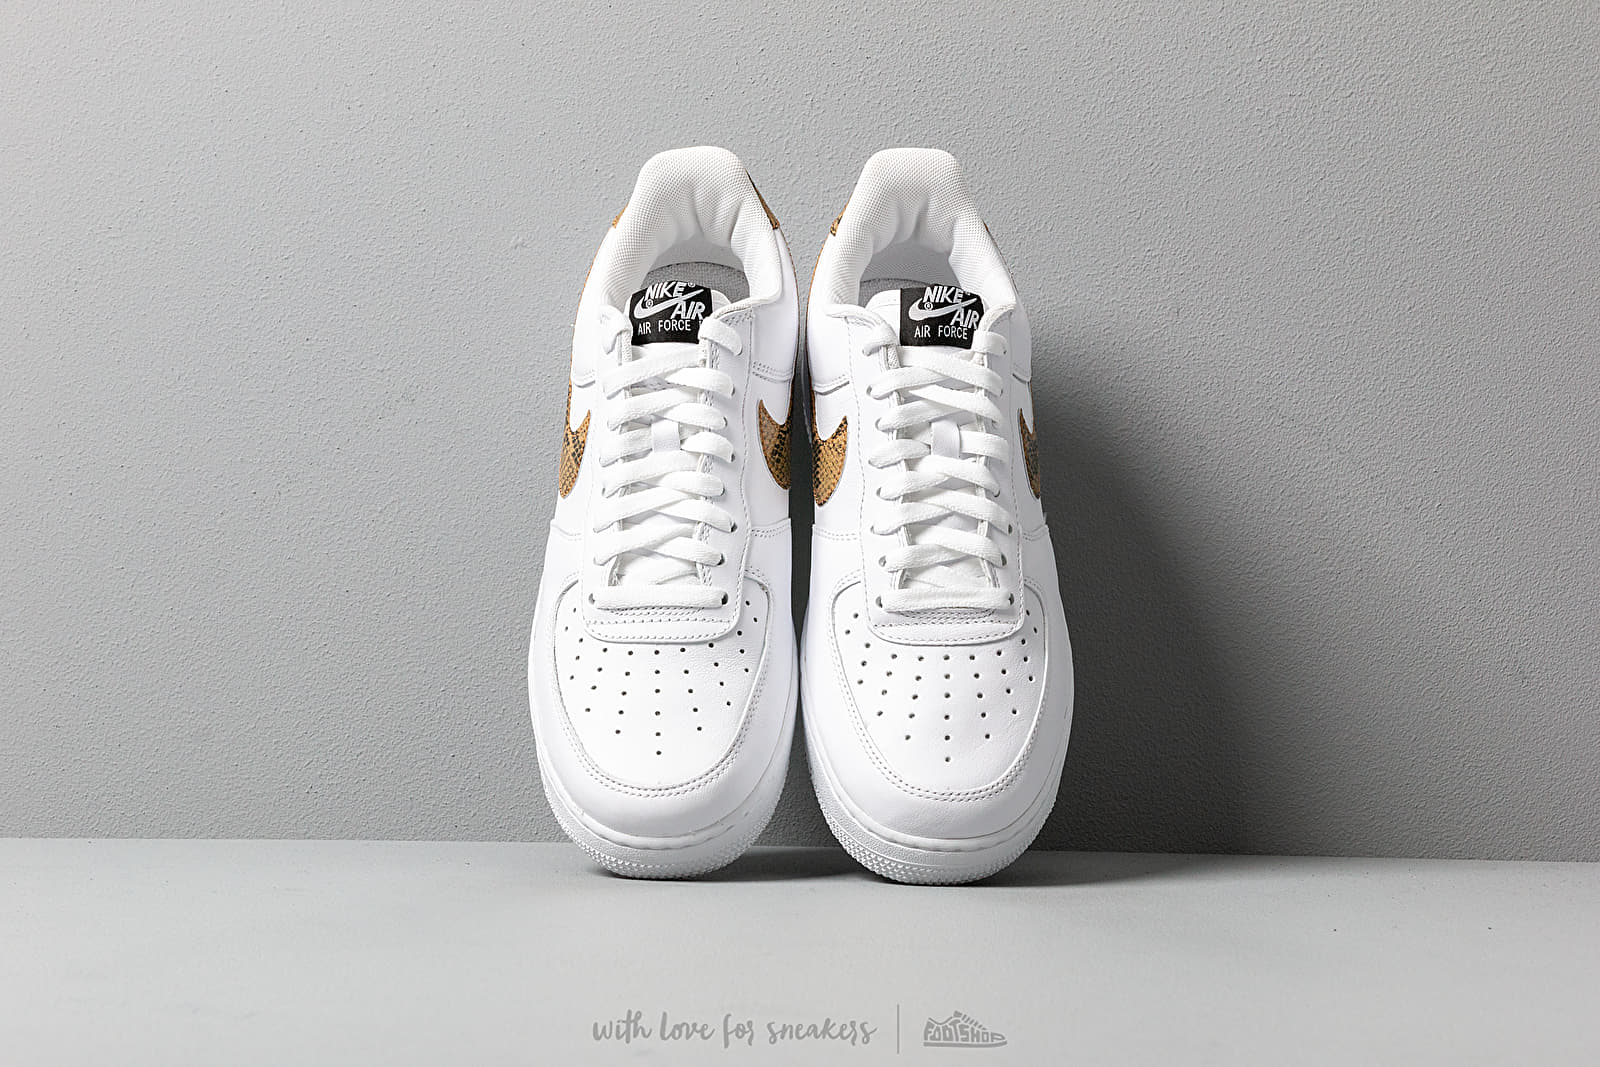 Nike Air Force 1 Low Retro Premium QS White Elemental Gold Dark Hazel Black | Footshop